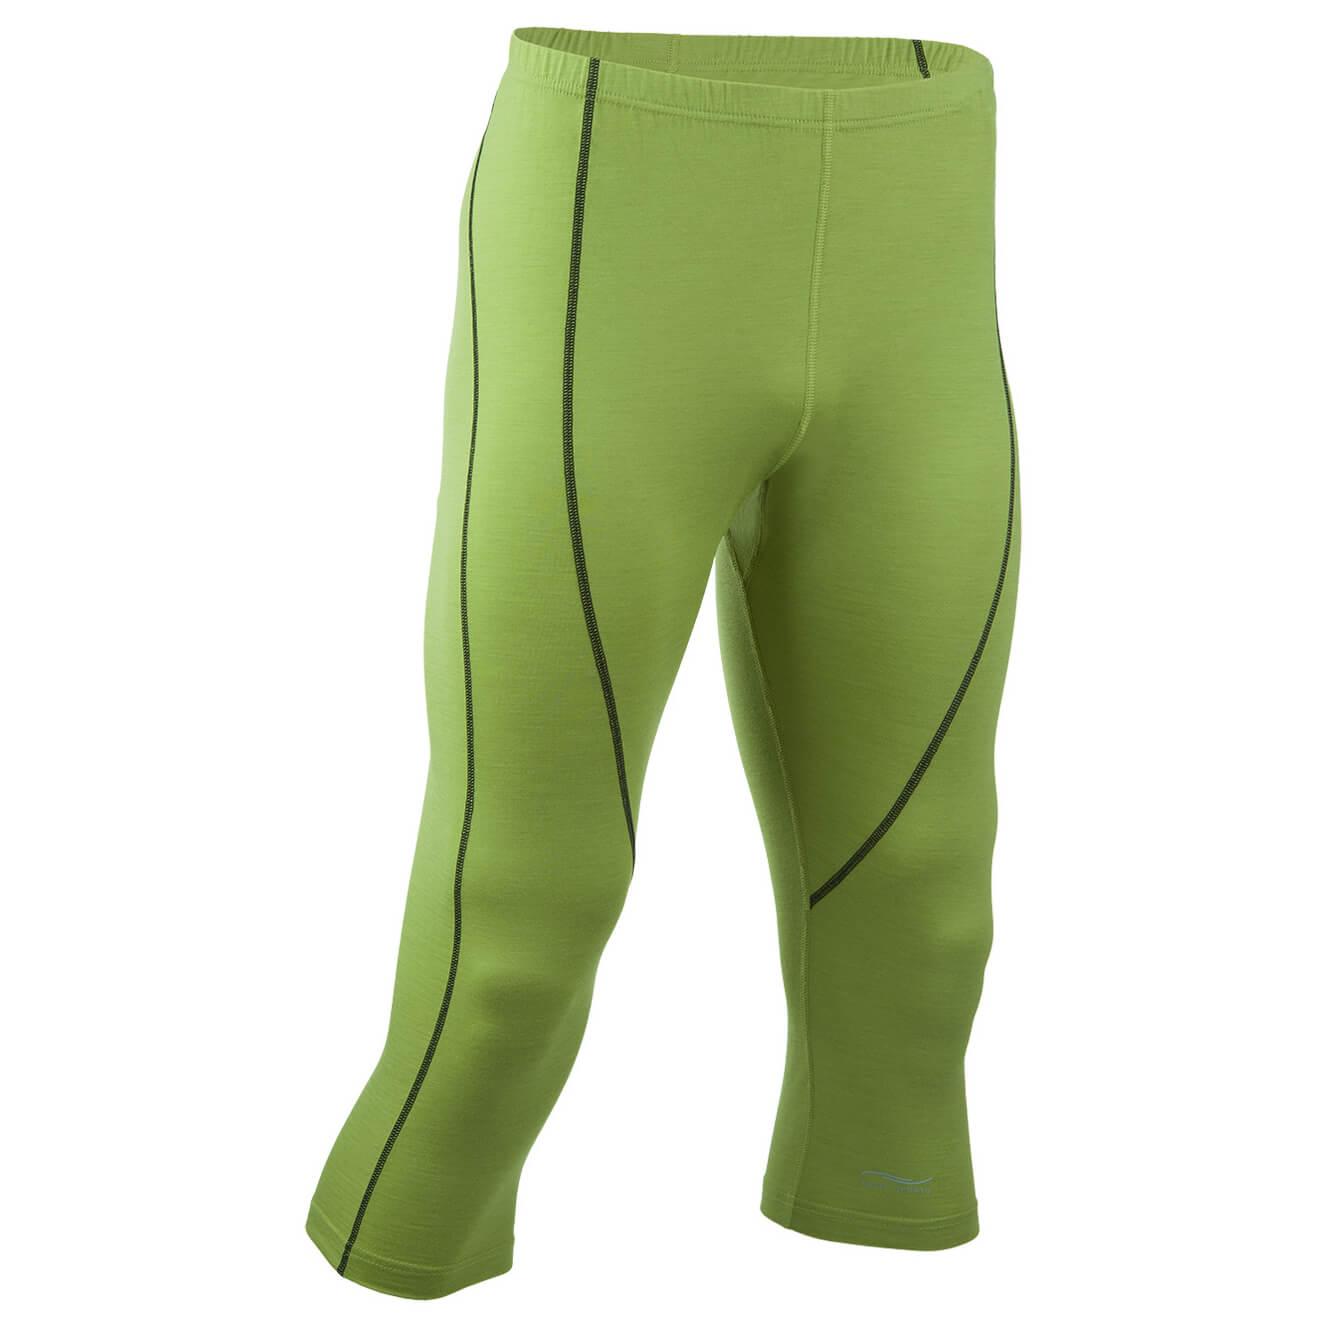 engel sports leggings 3 4 long underpants men 39 s free. Black Bedroom Furniture Sets. Home Design Ideas